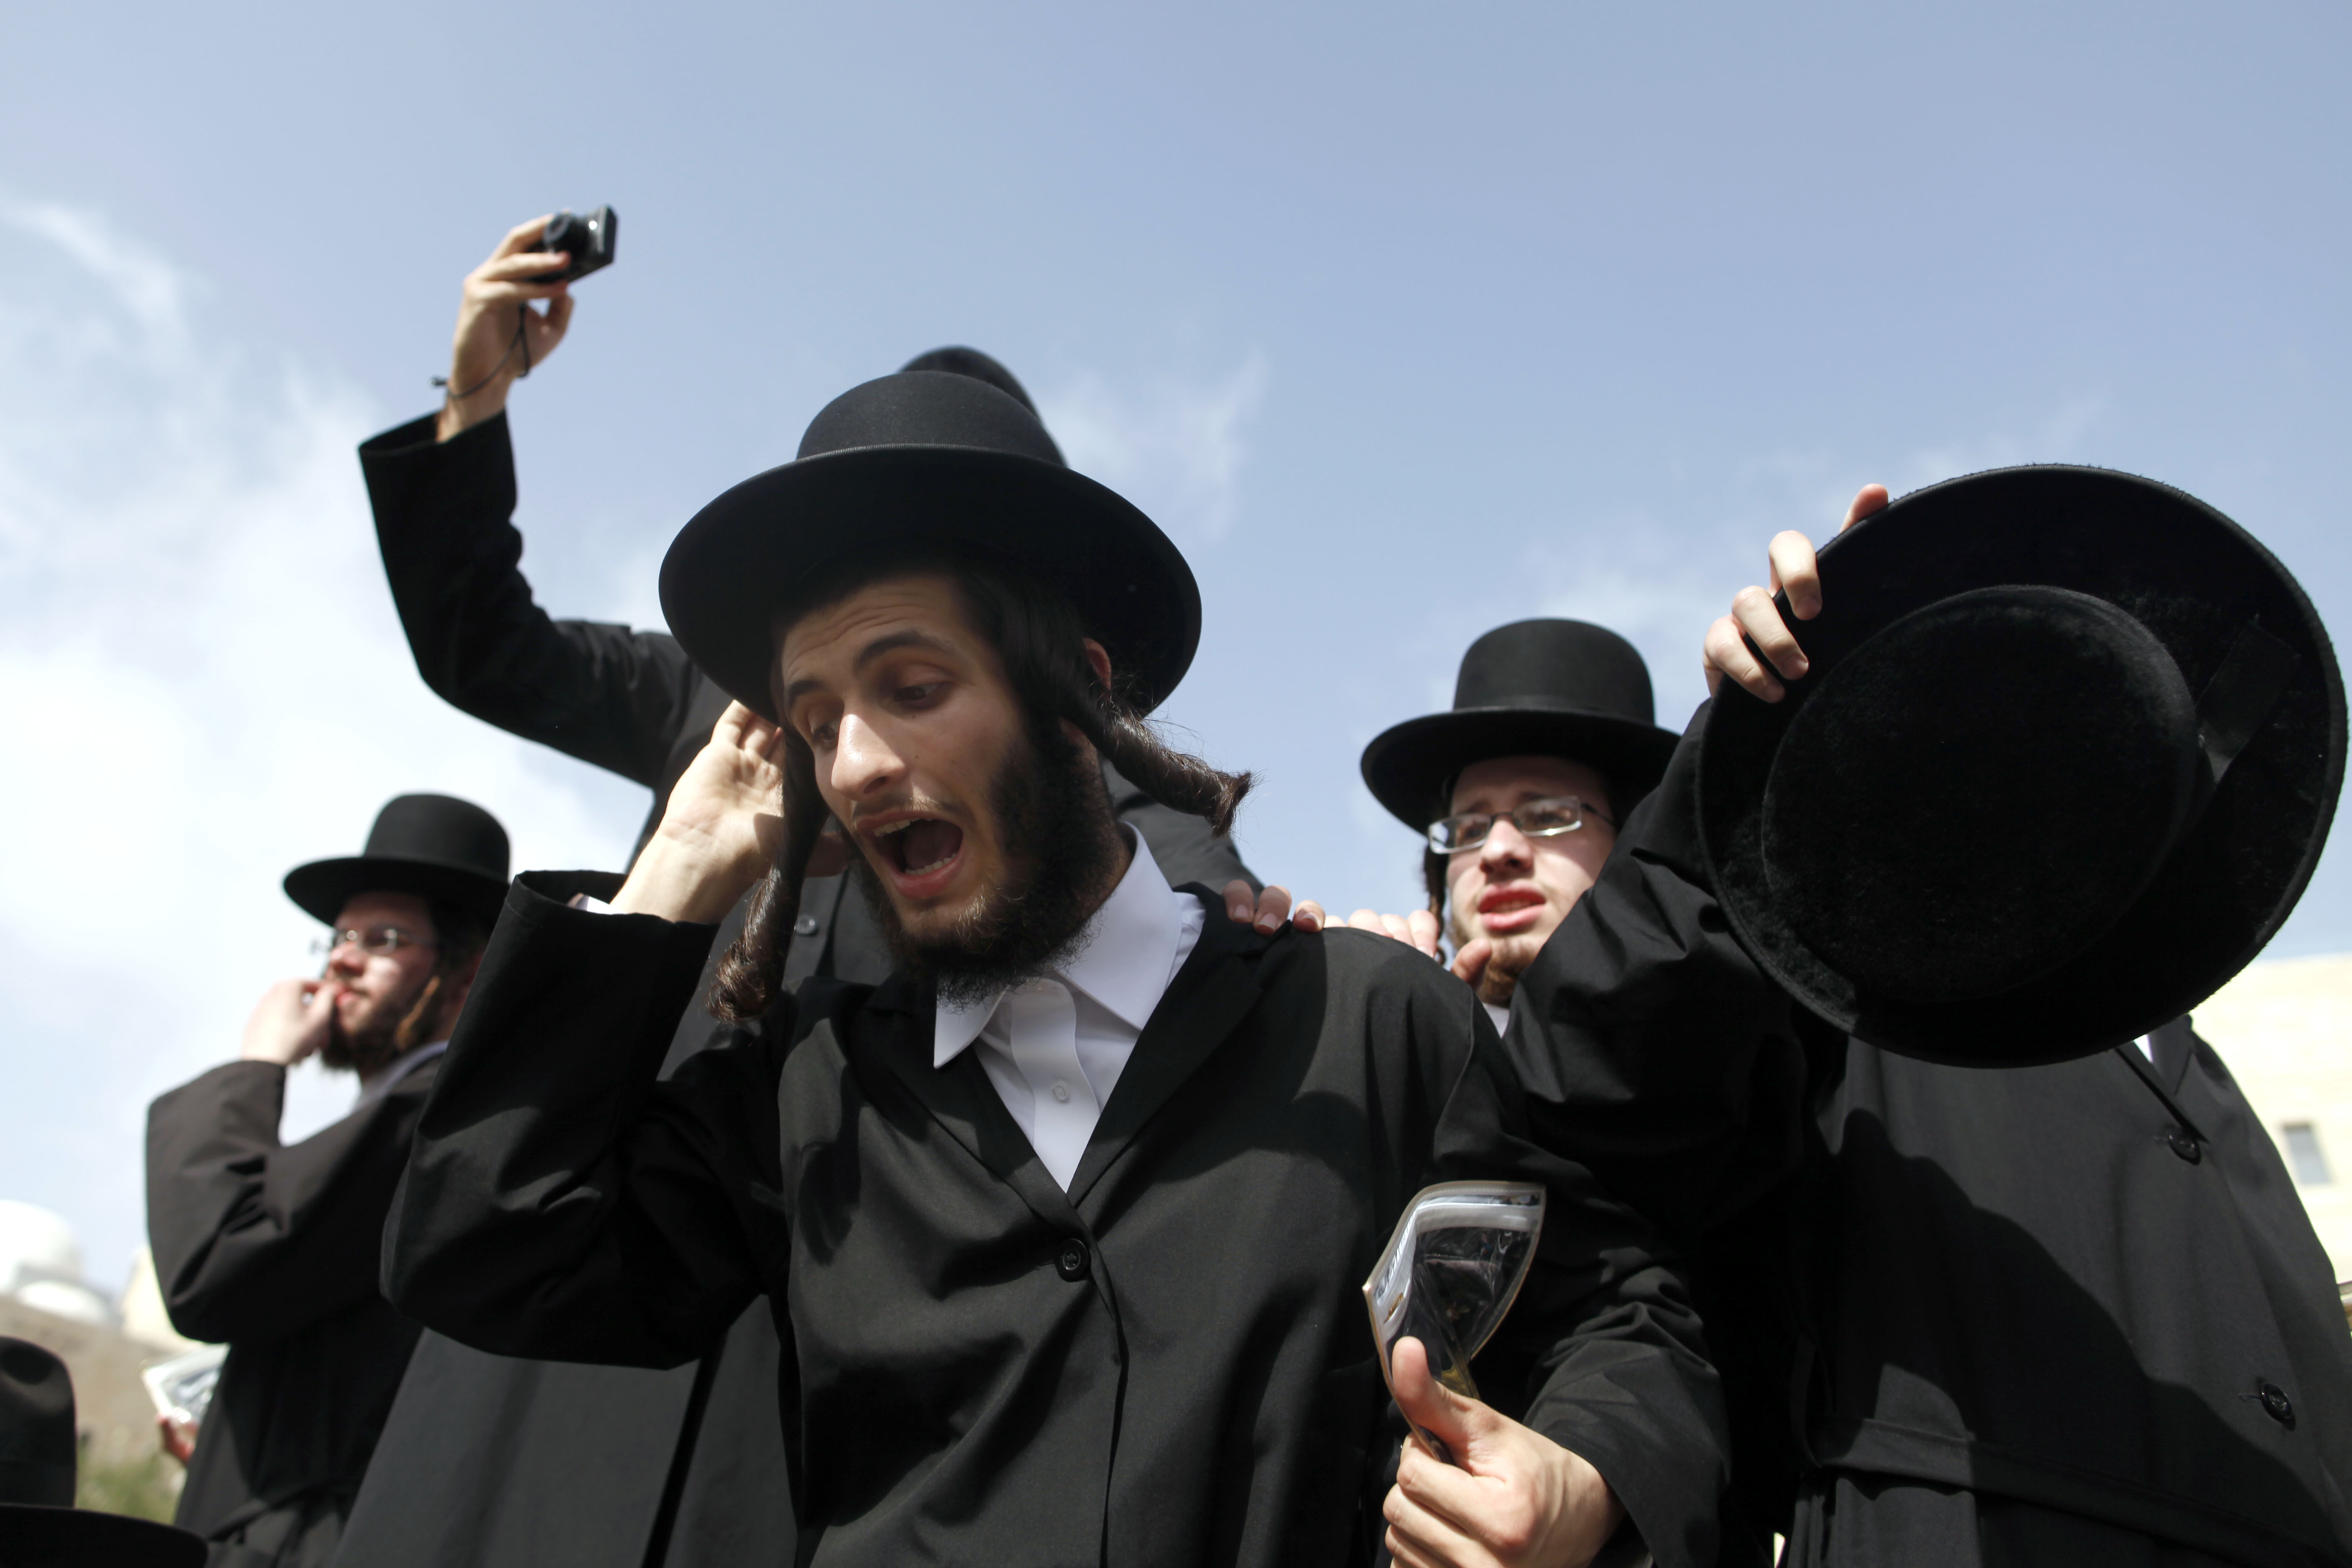 What Are Orthodox & Unorthodox in Religion?